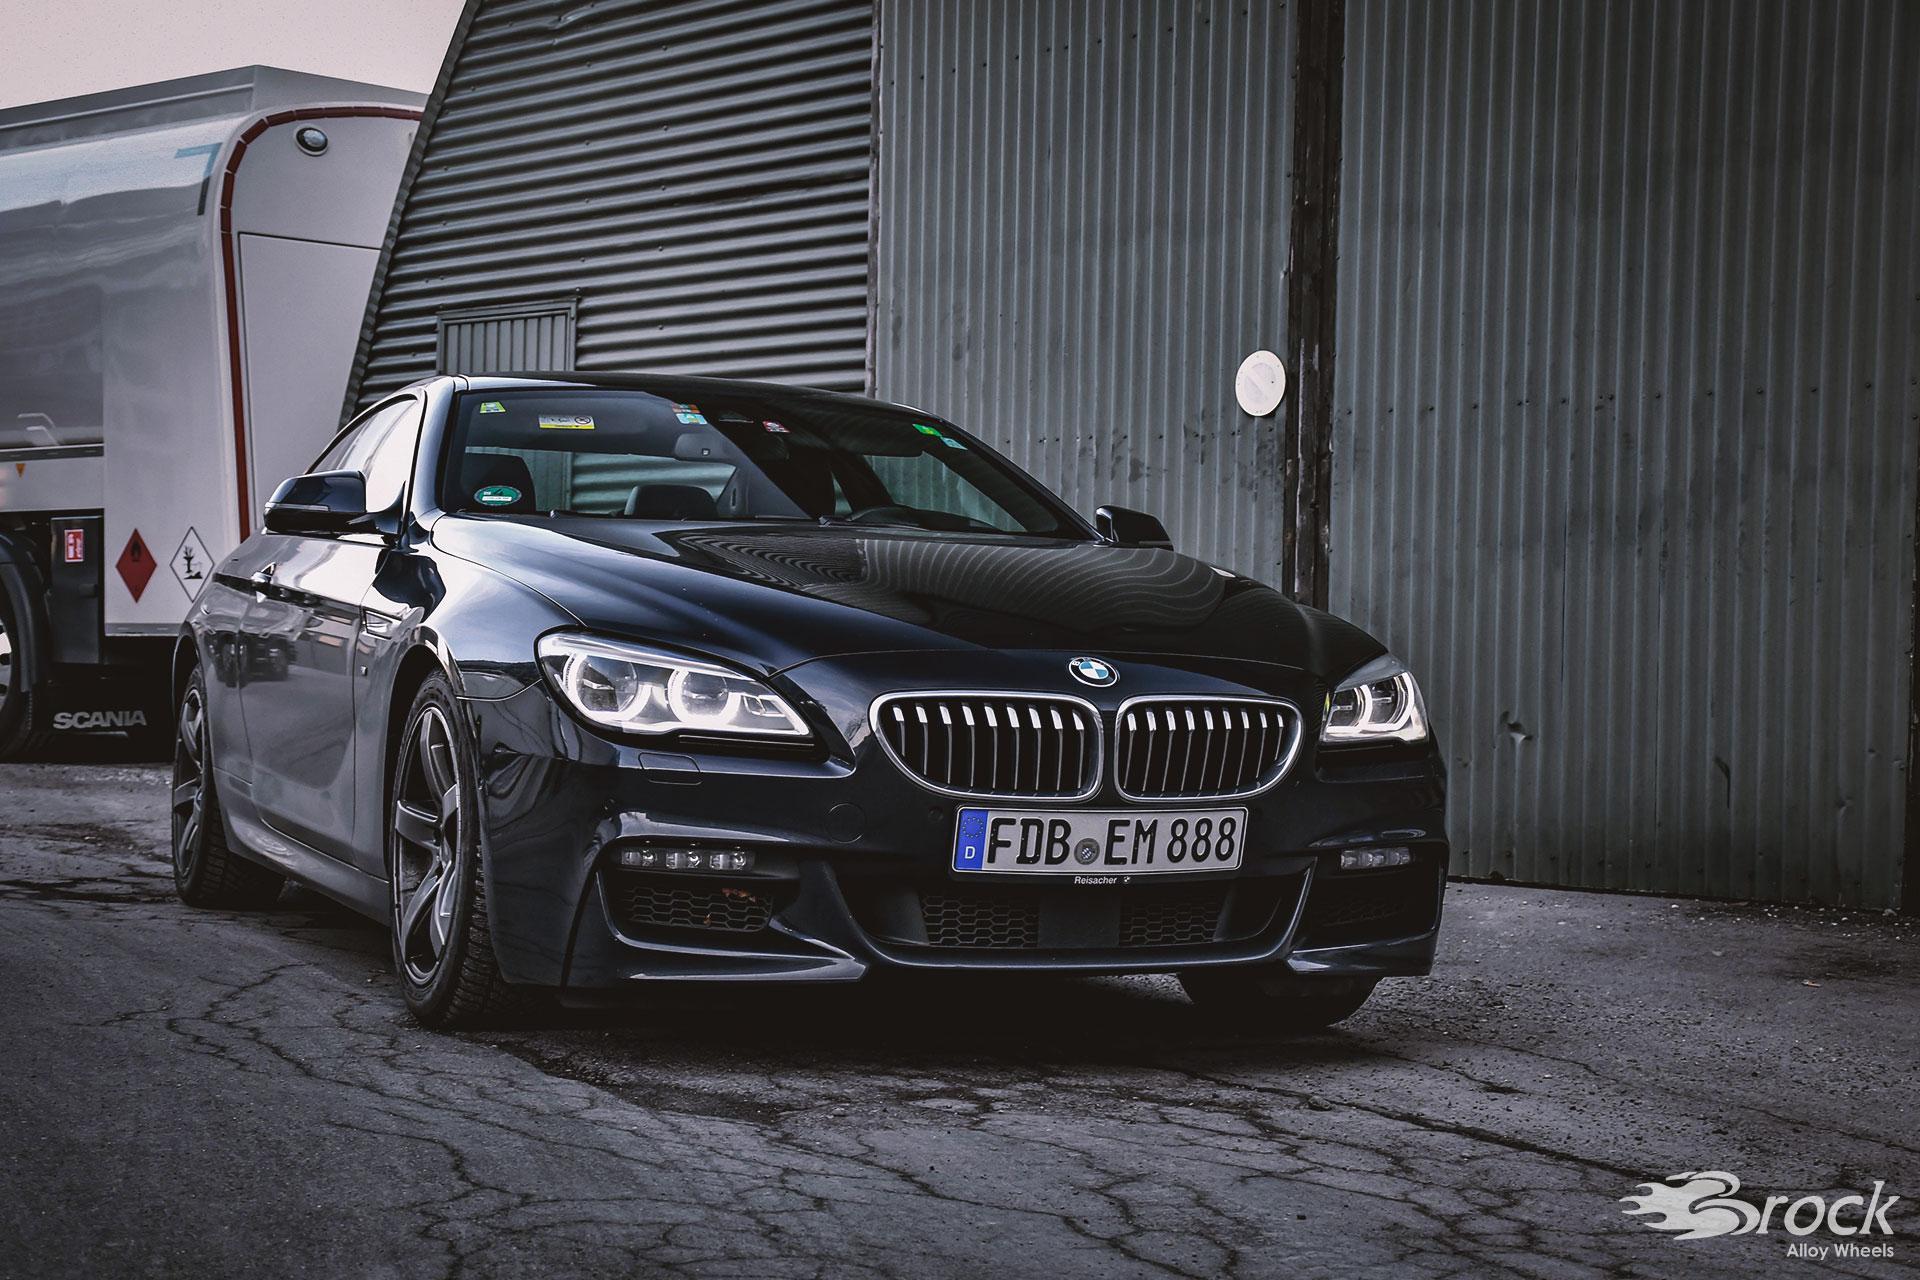 BMW 640I F13 Brock B35 TM